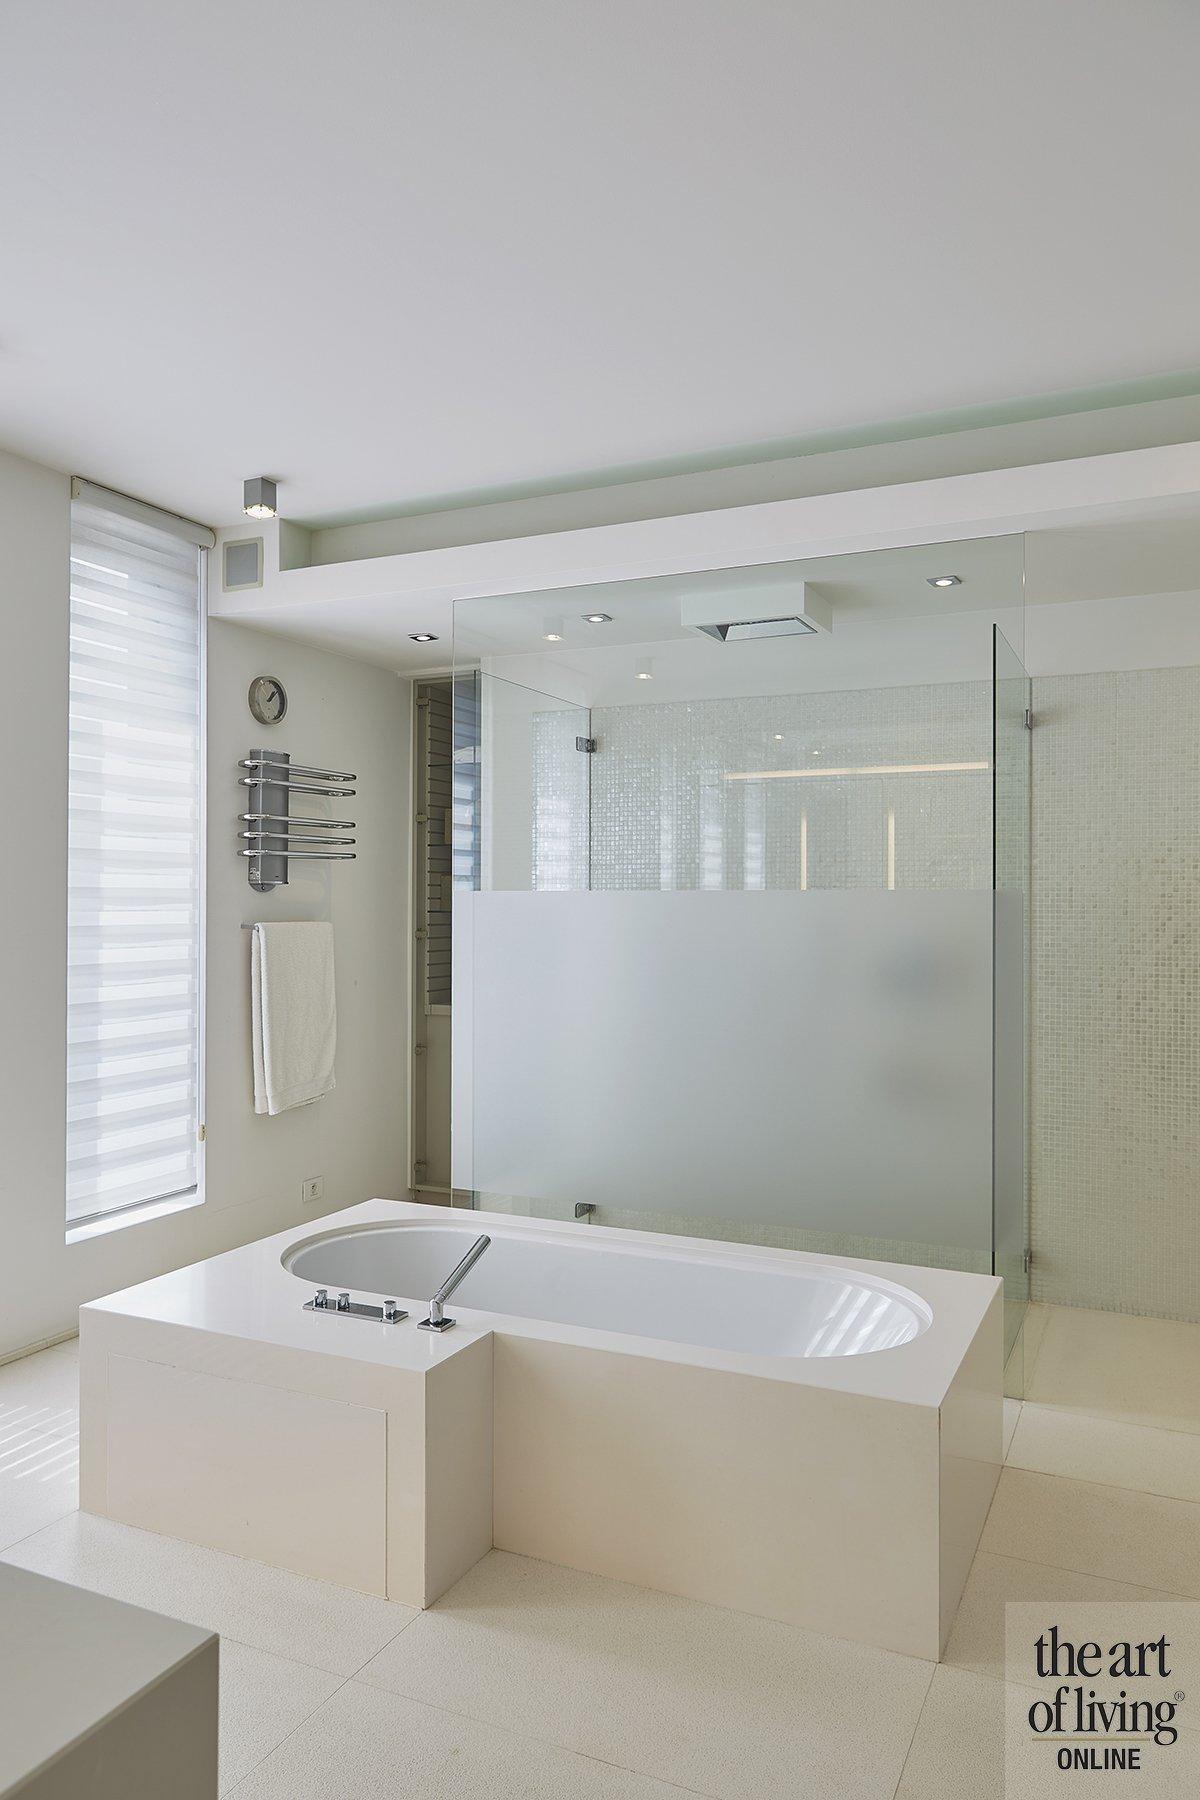 licht interieur, Simoni Architecten, the art of living